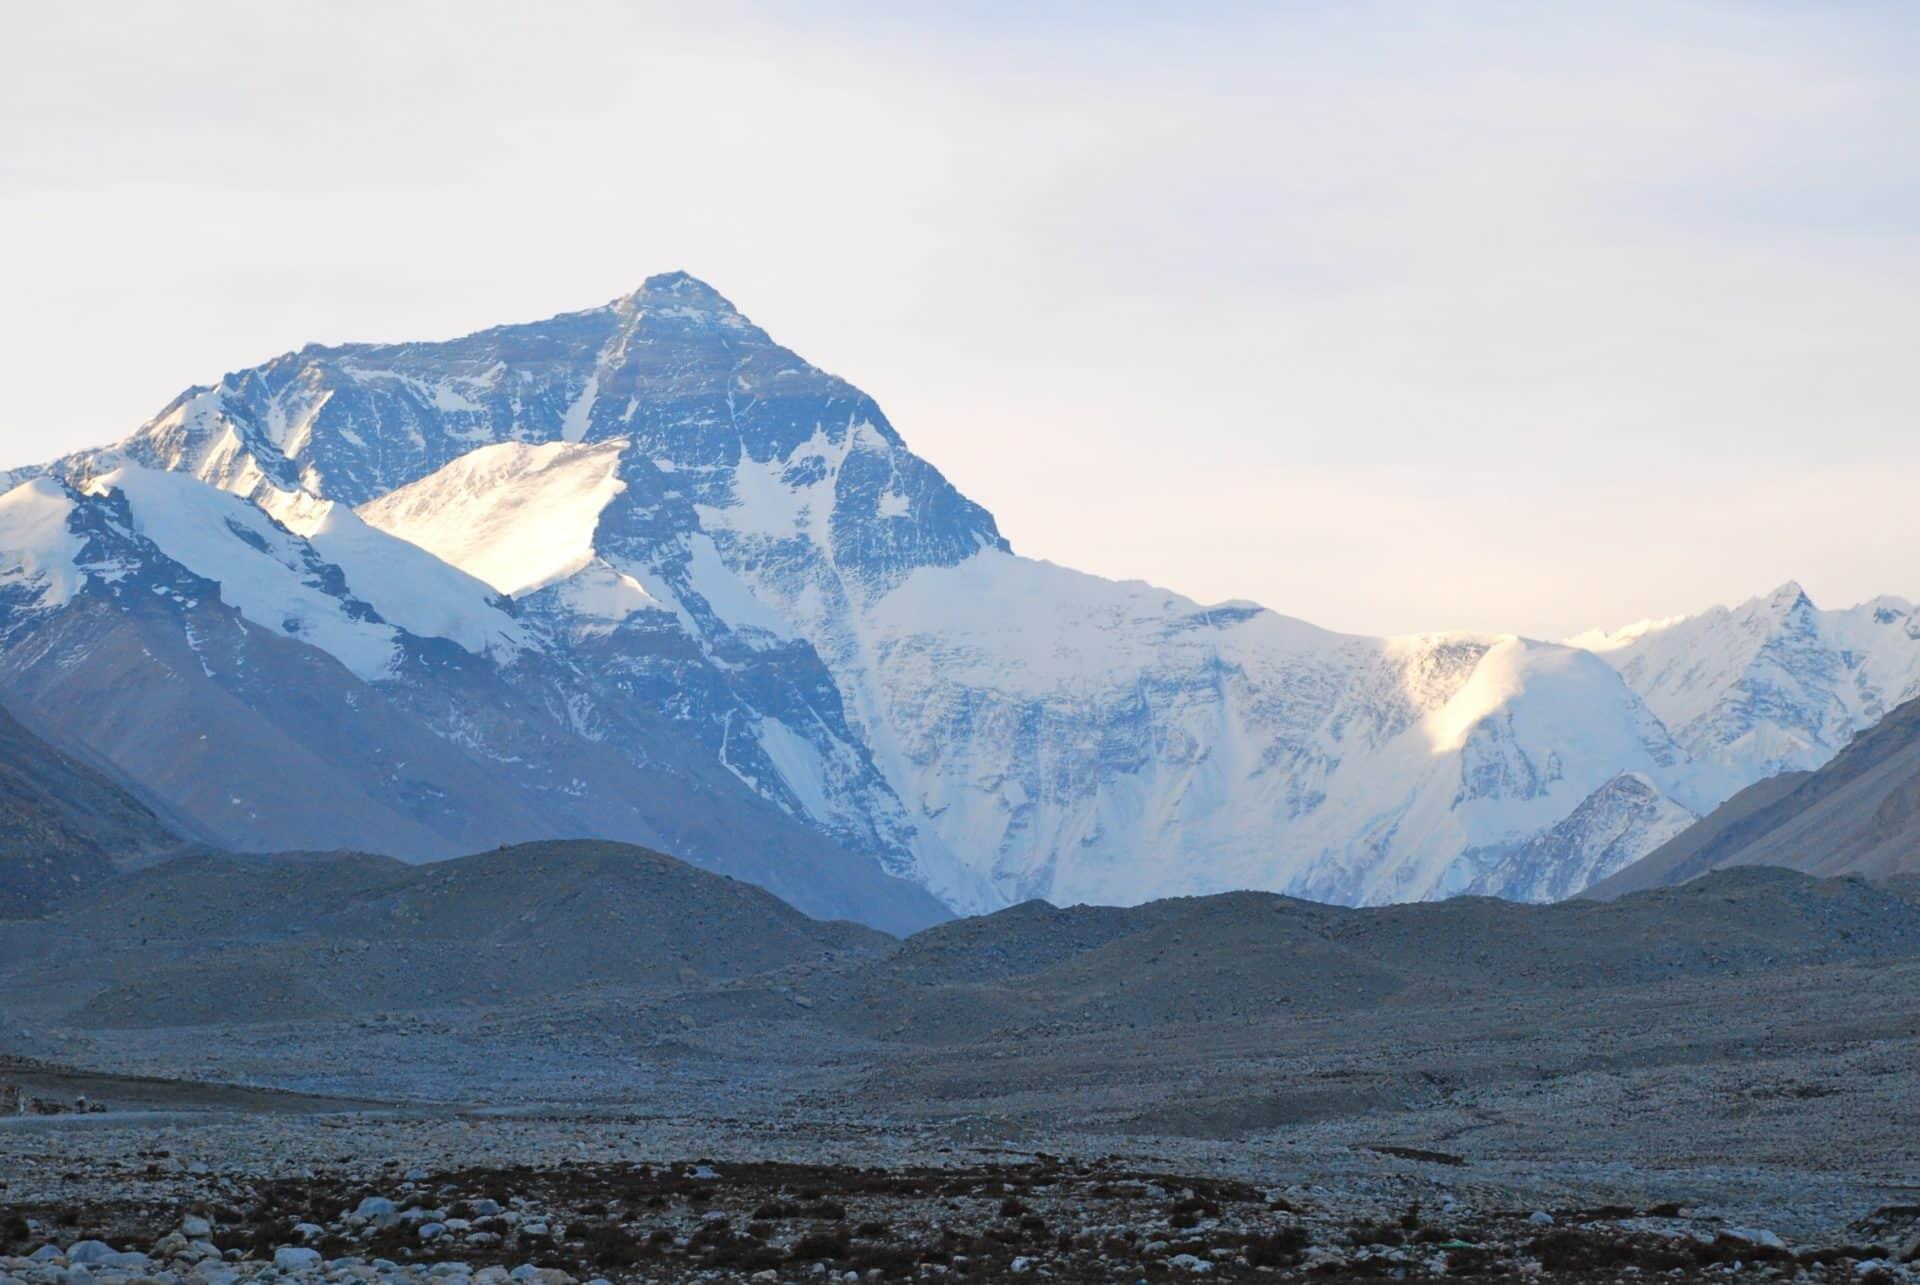 Everest Region, Dudh Kunda 19 Day Guided Trek